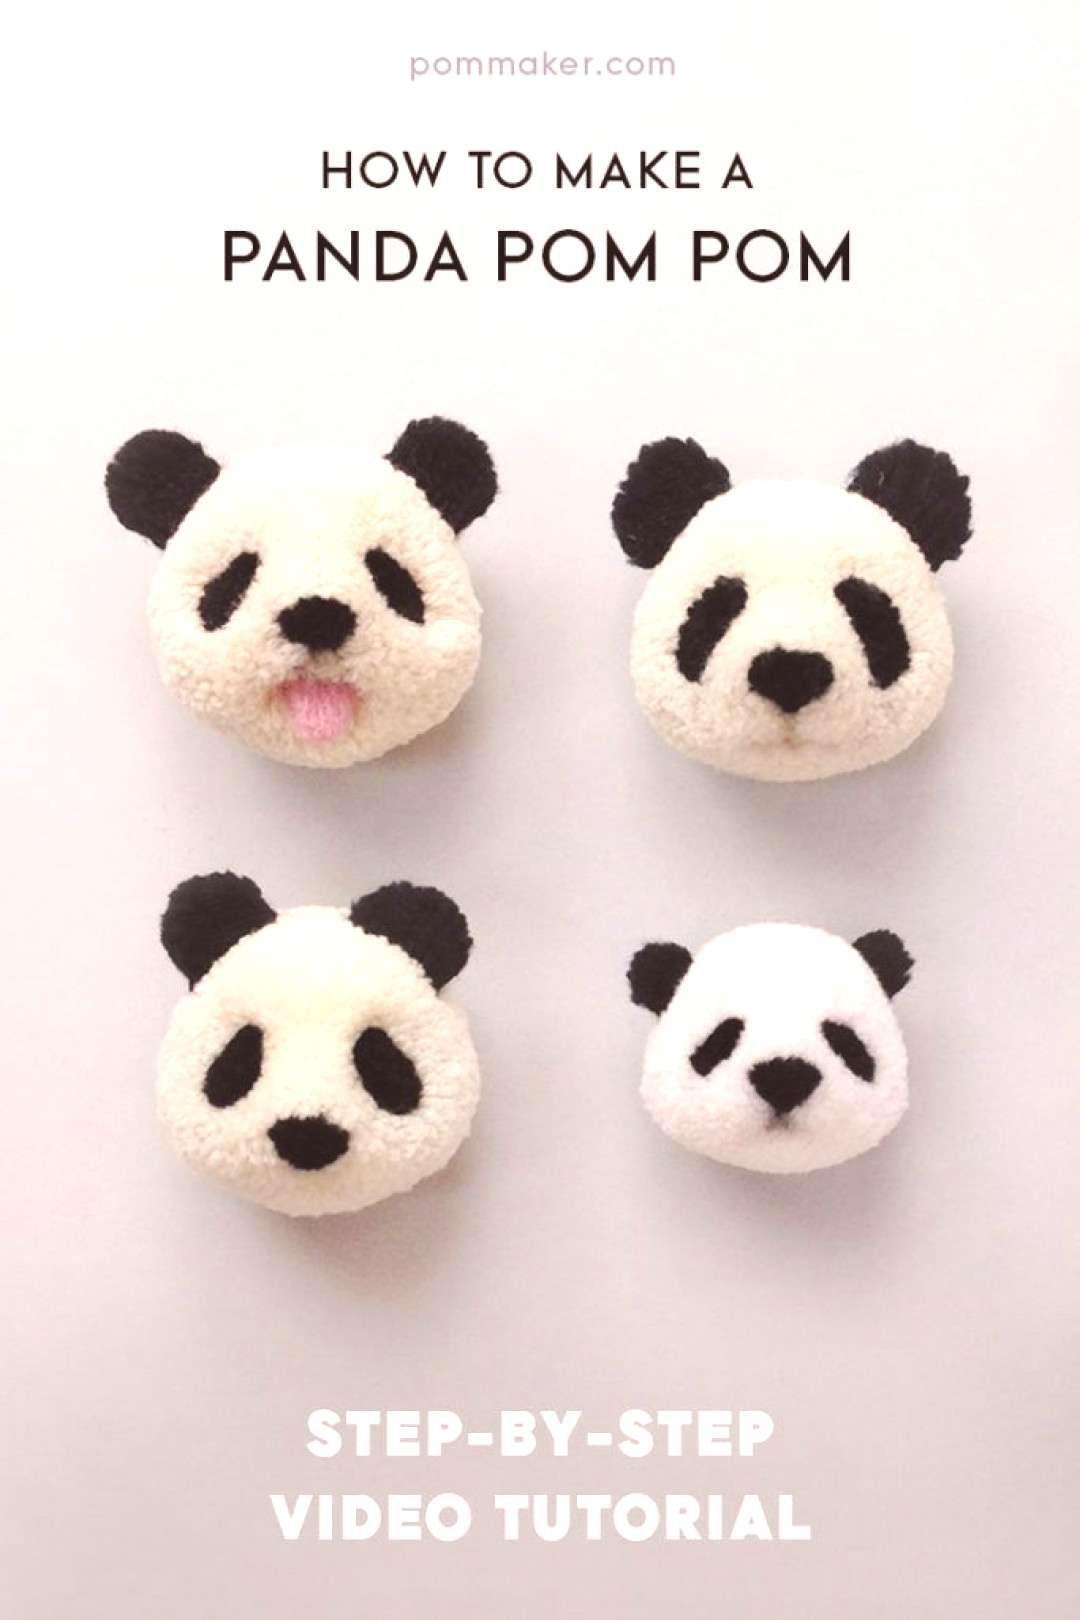 Pom Maker Tutorial  How to Make a Panda Pompom   You can find Pom poms and more on our websitePom Maker Tutorial  How to Make a Panda Pompom